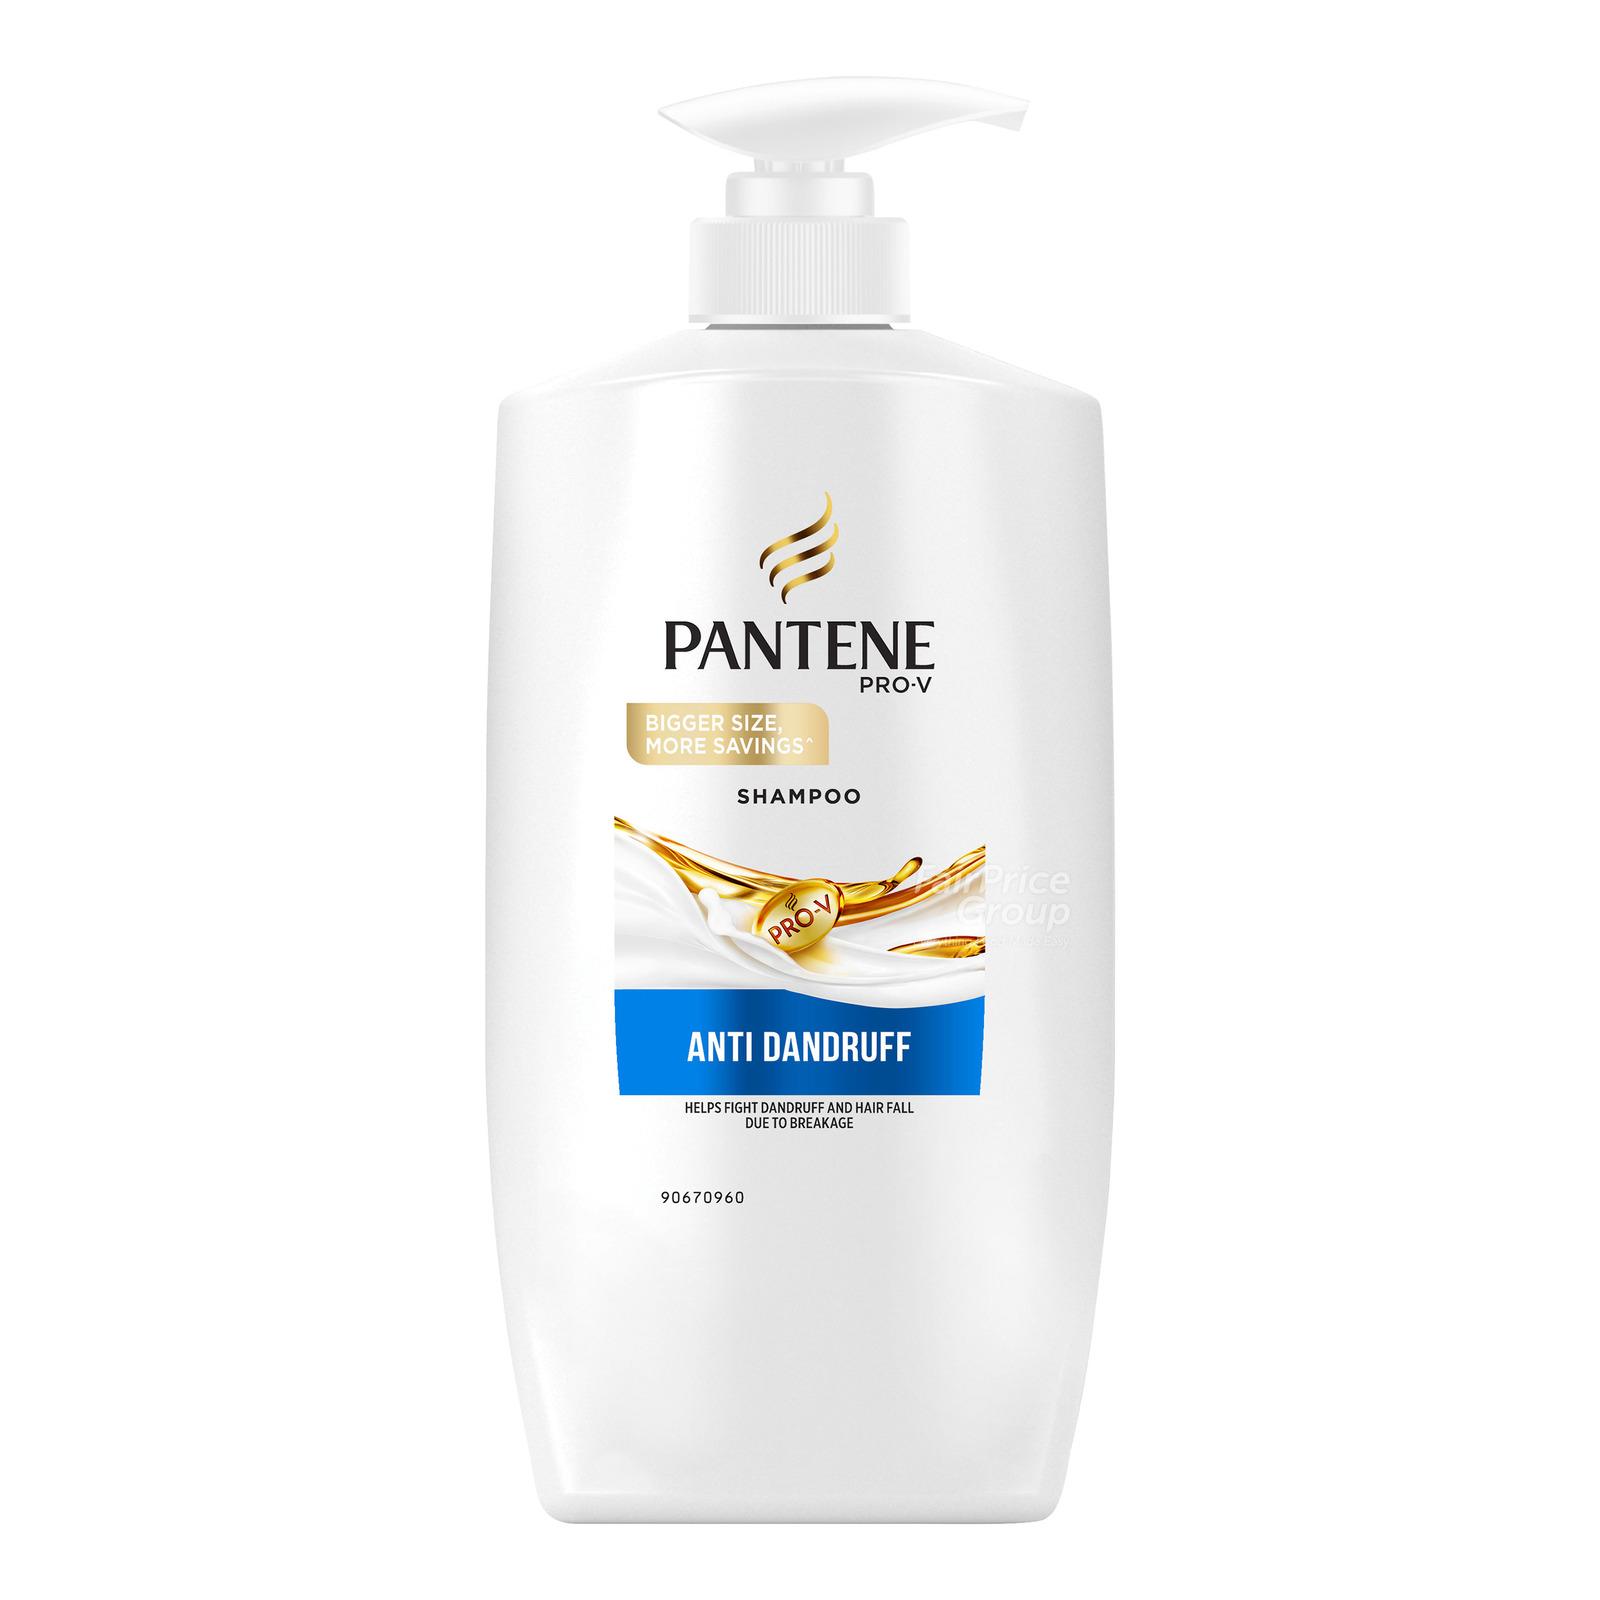 Pantene Pro-V Shampoo - Anti Dandruff